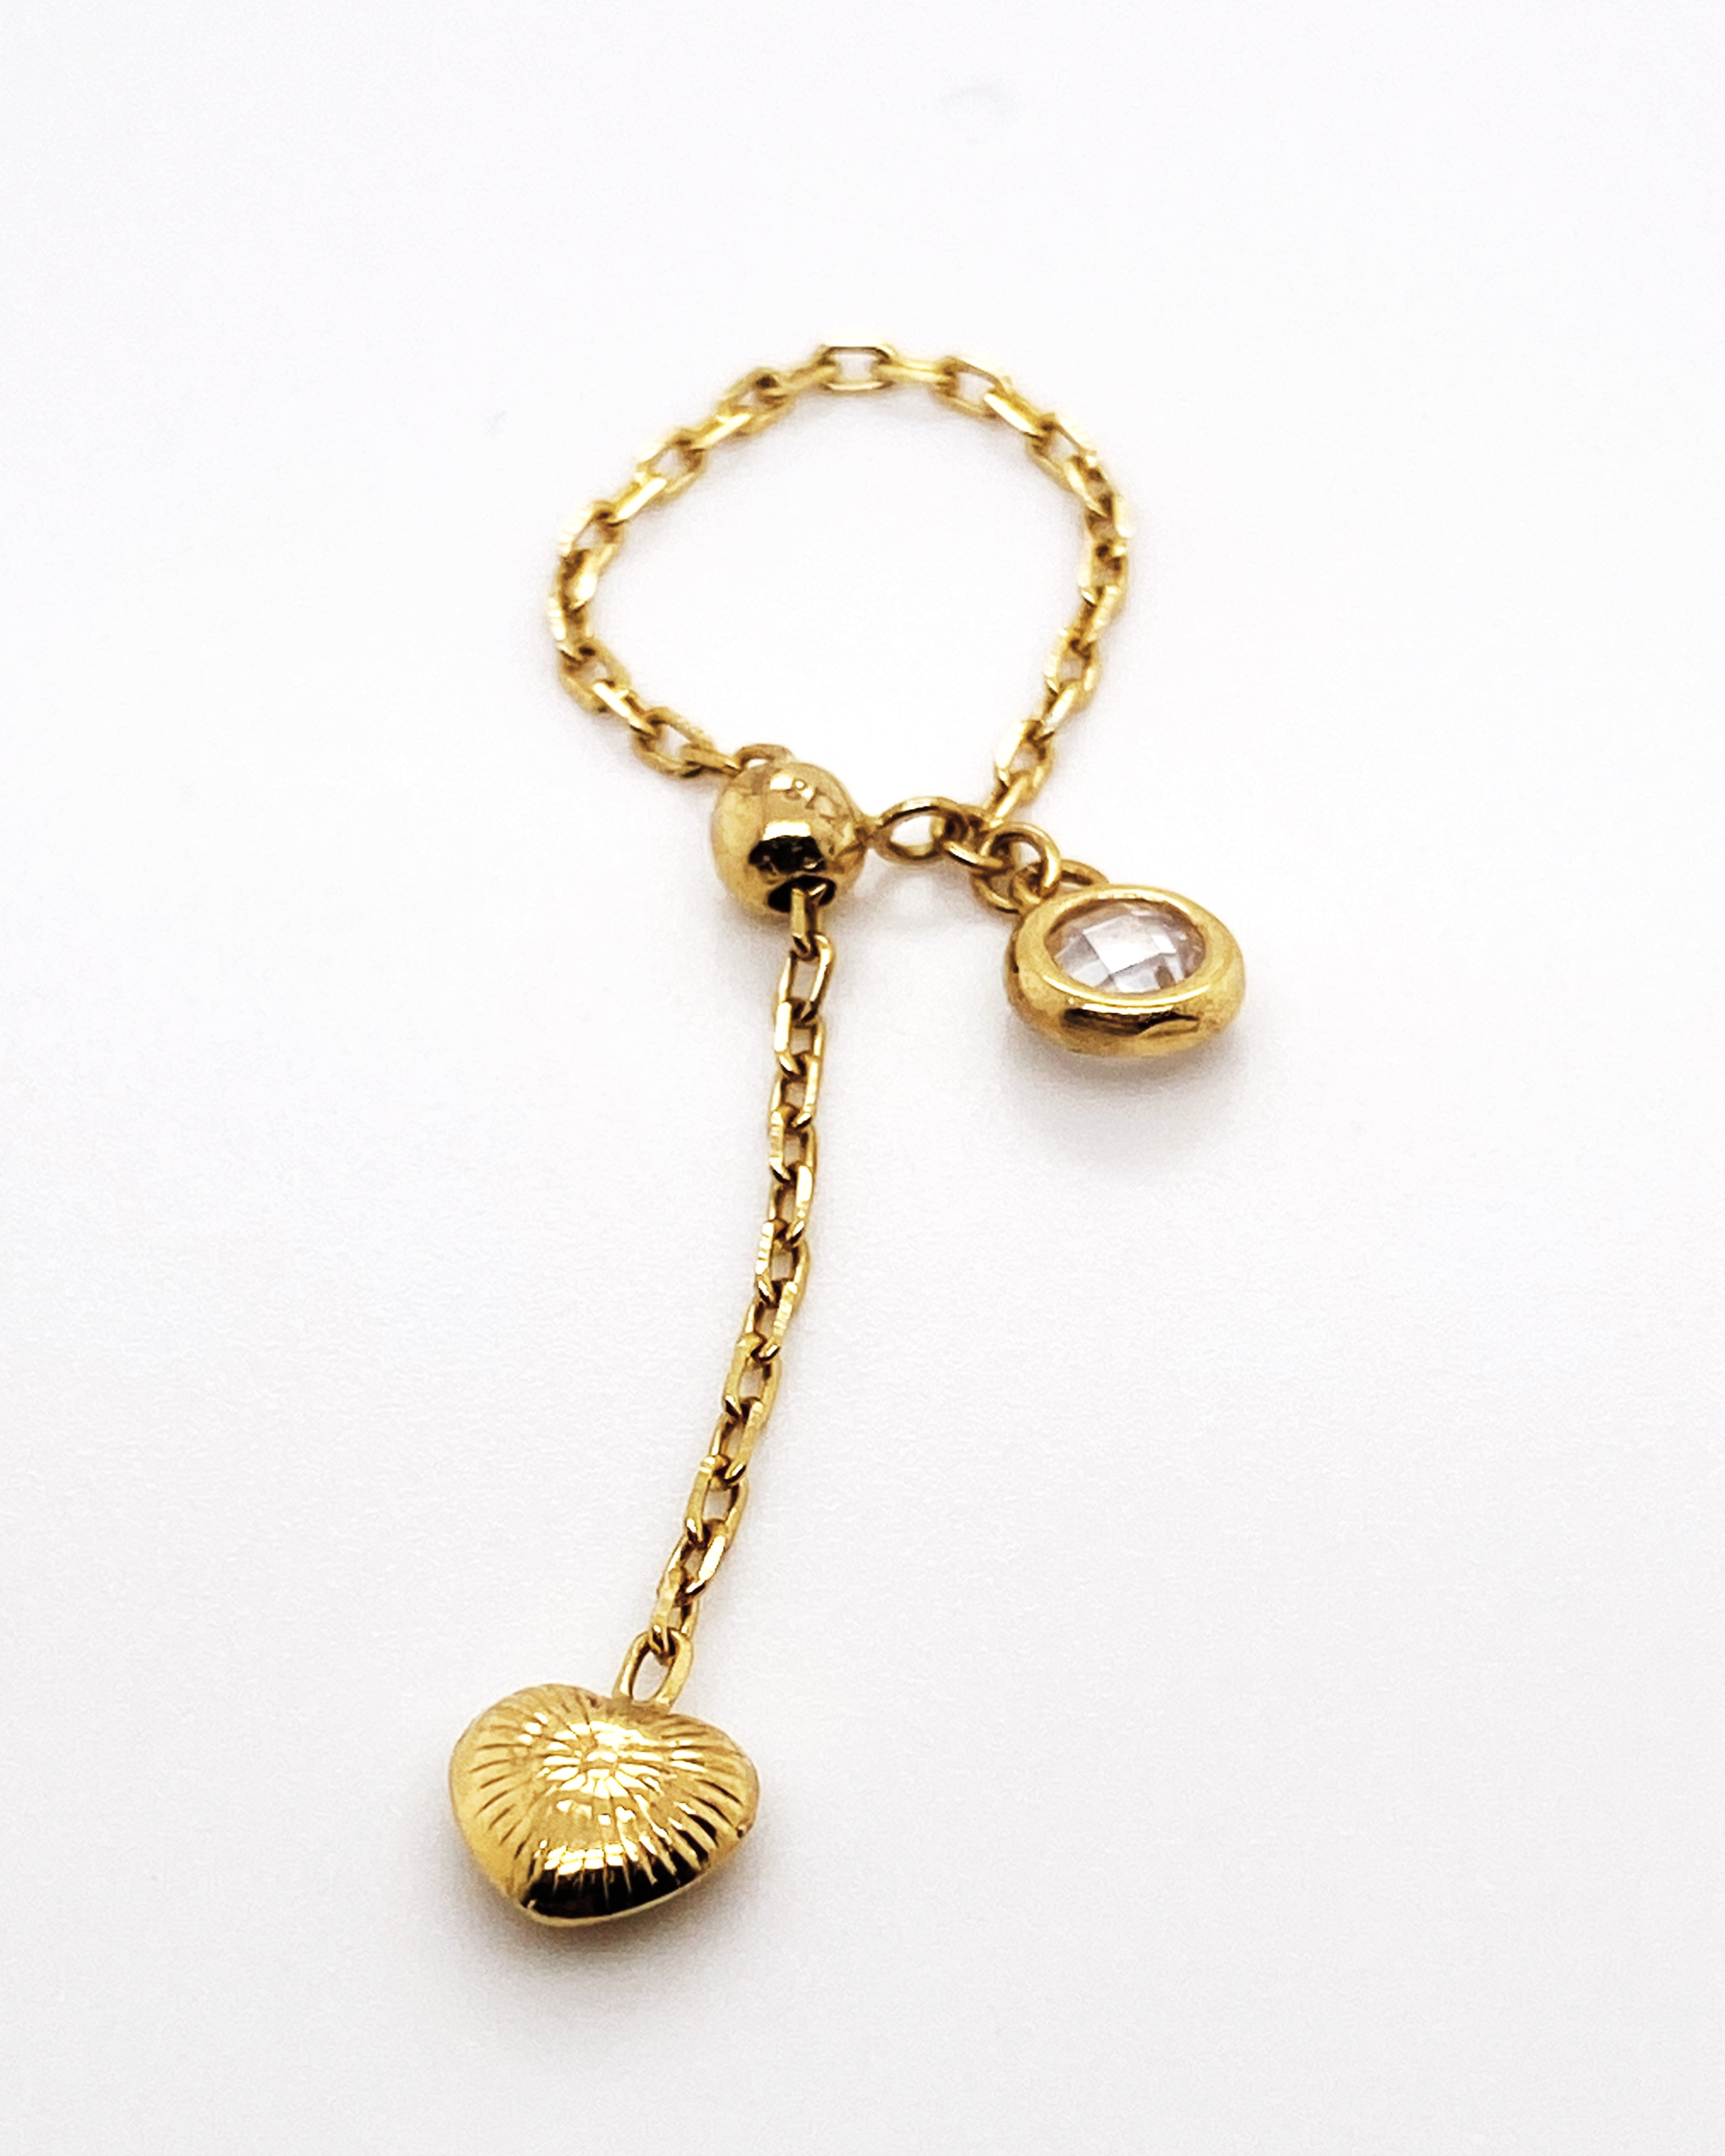 1.01 grams 18k SD Gold Adjustable Ring